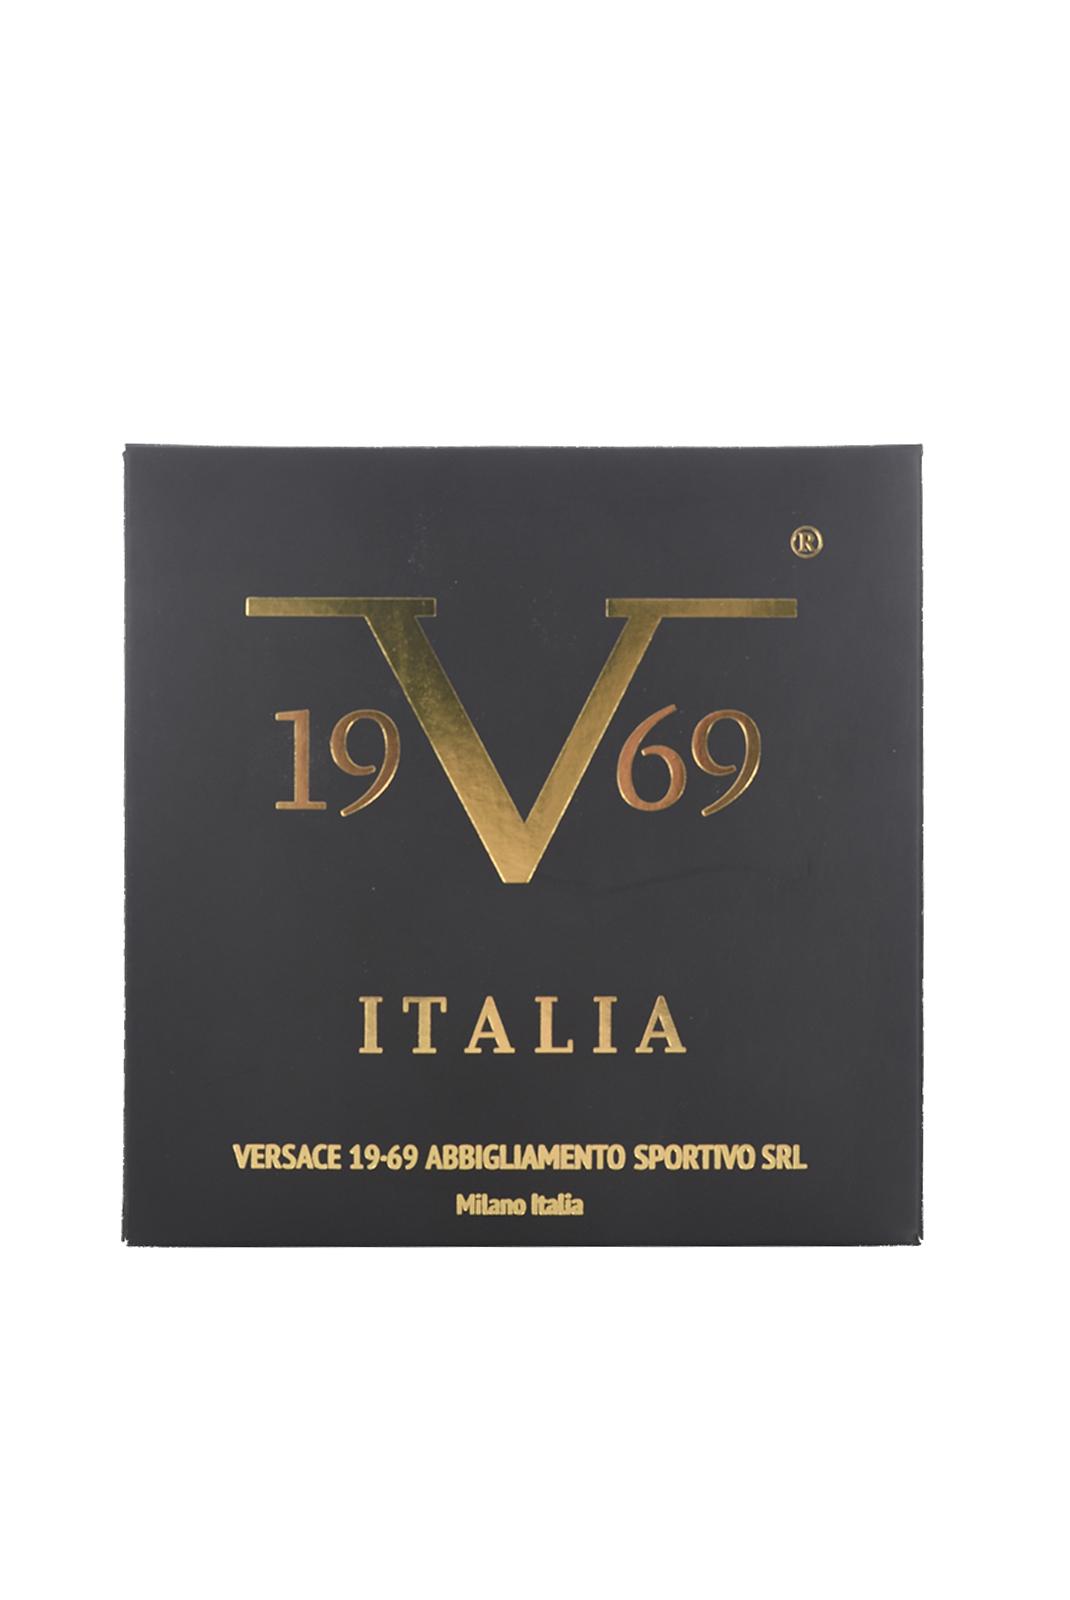 Ceintures  V1969 by Versace 1969 LETO BLEU MARINE